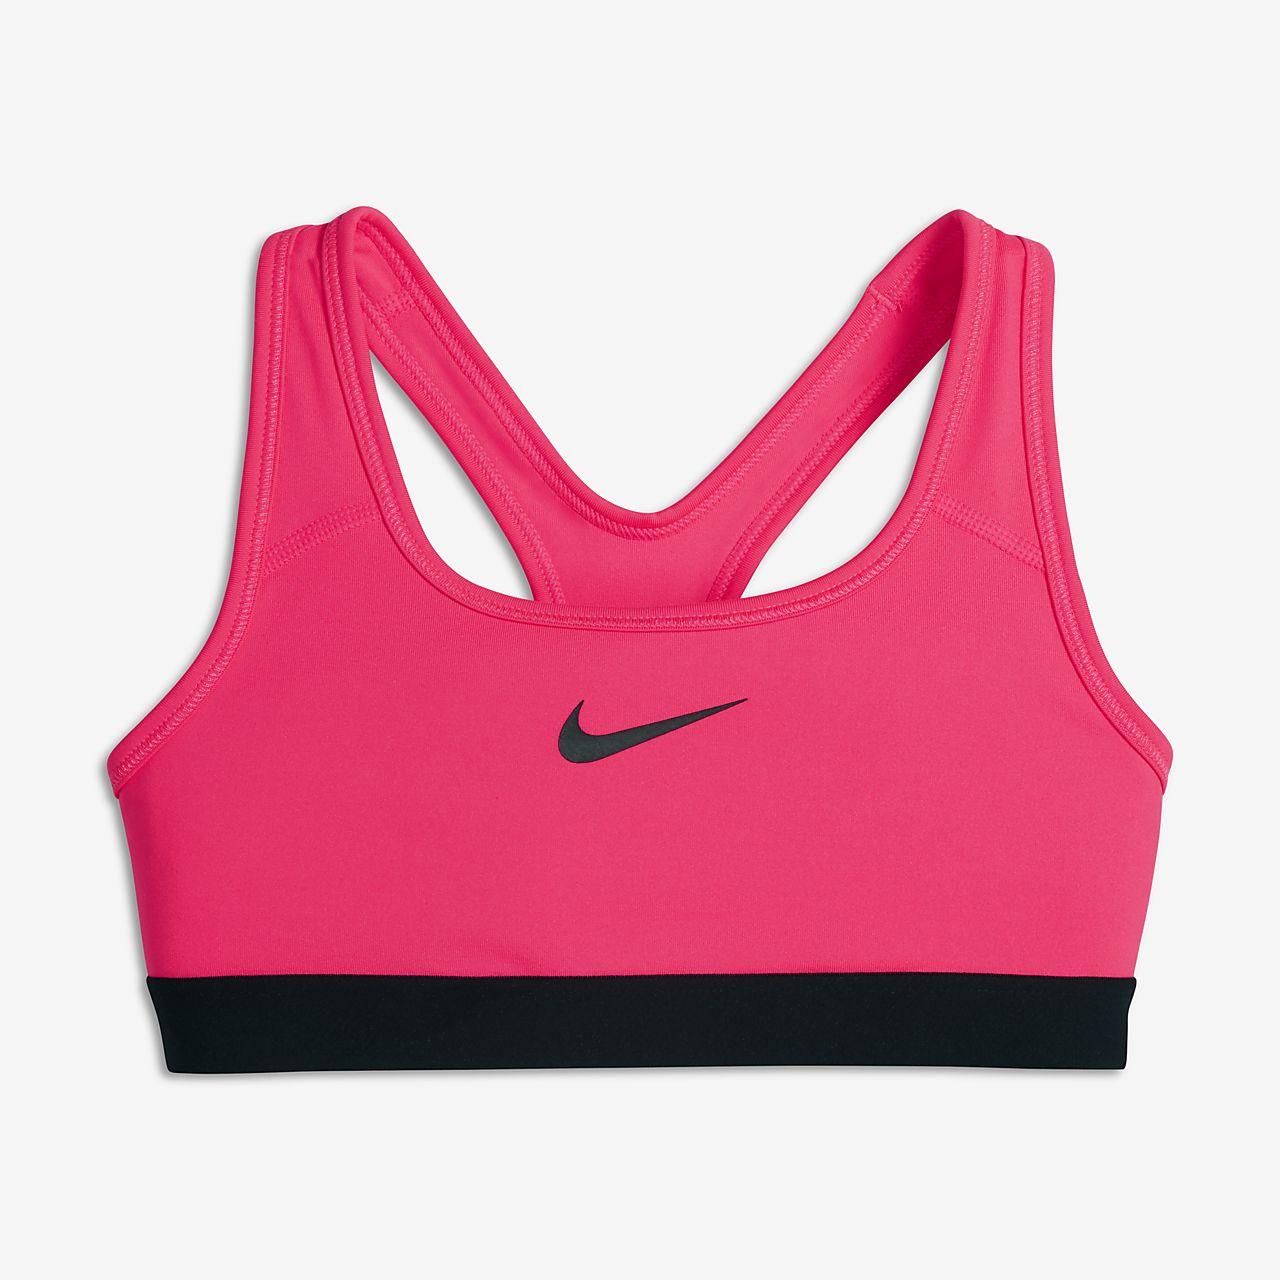 Nike Classic Big Kids Girls Sports Bra Nikecom-1586